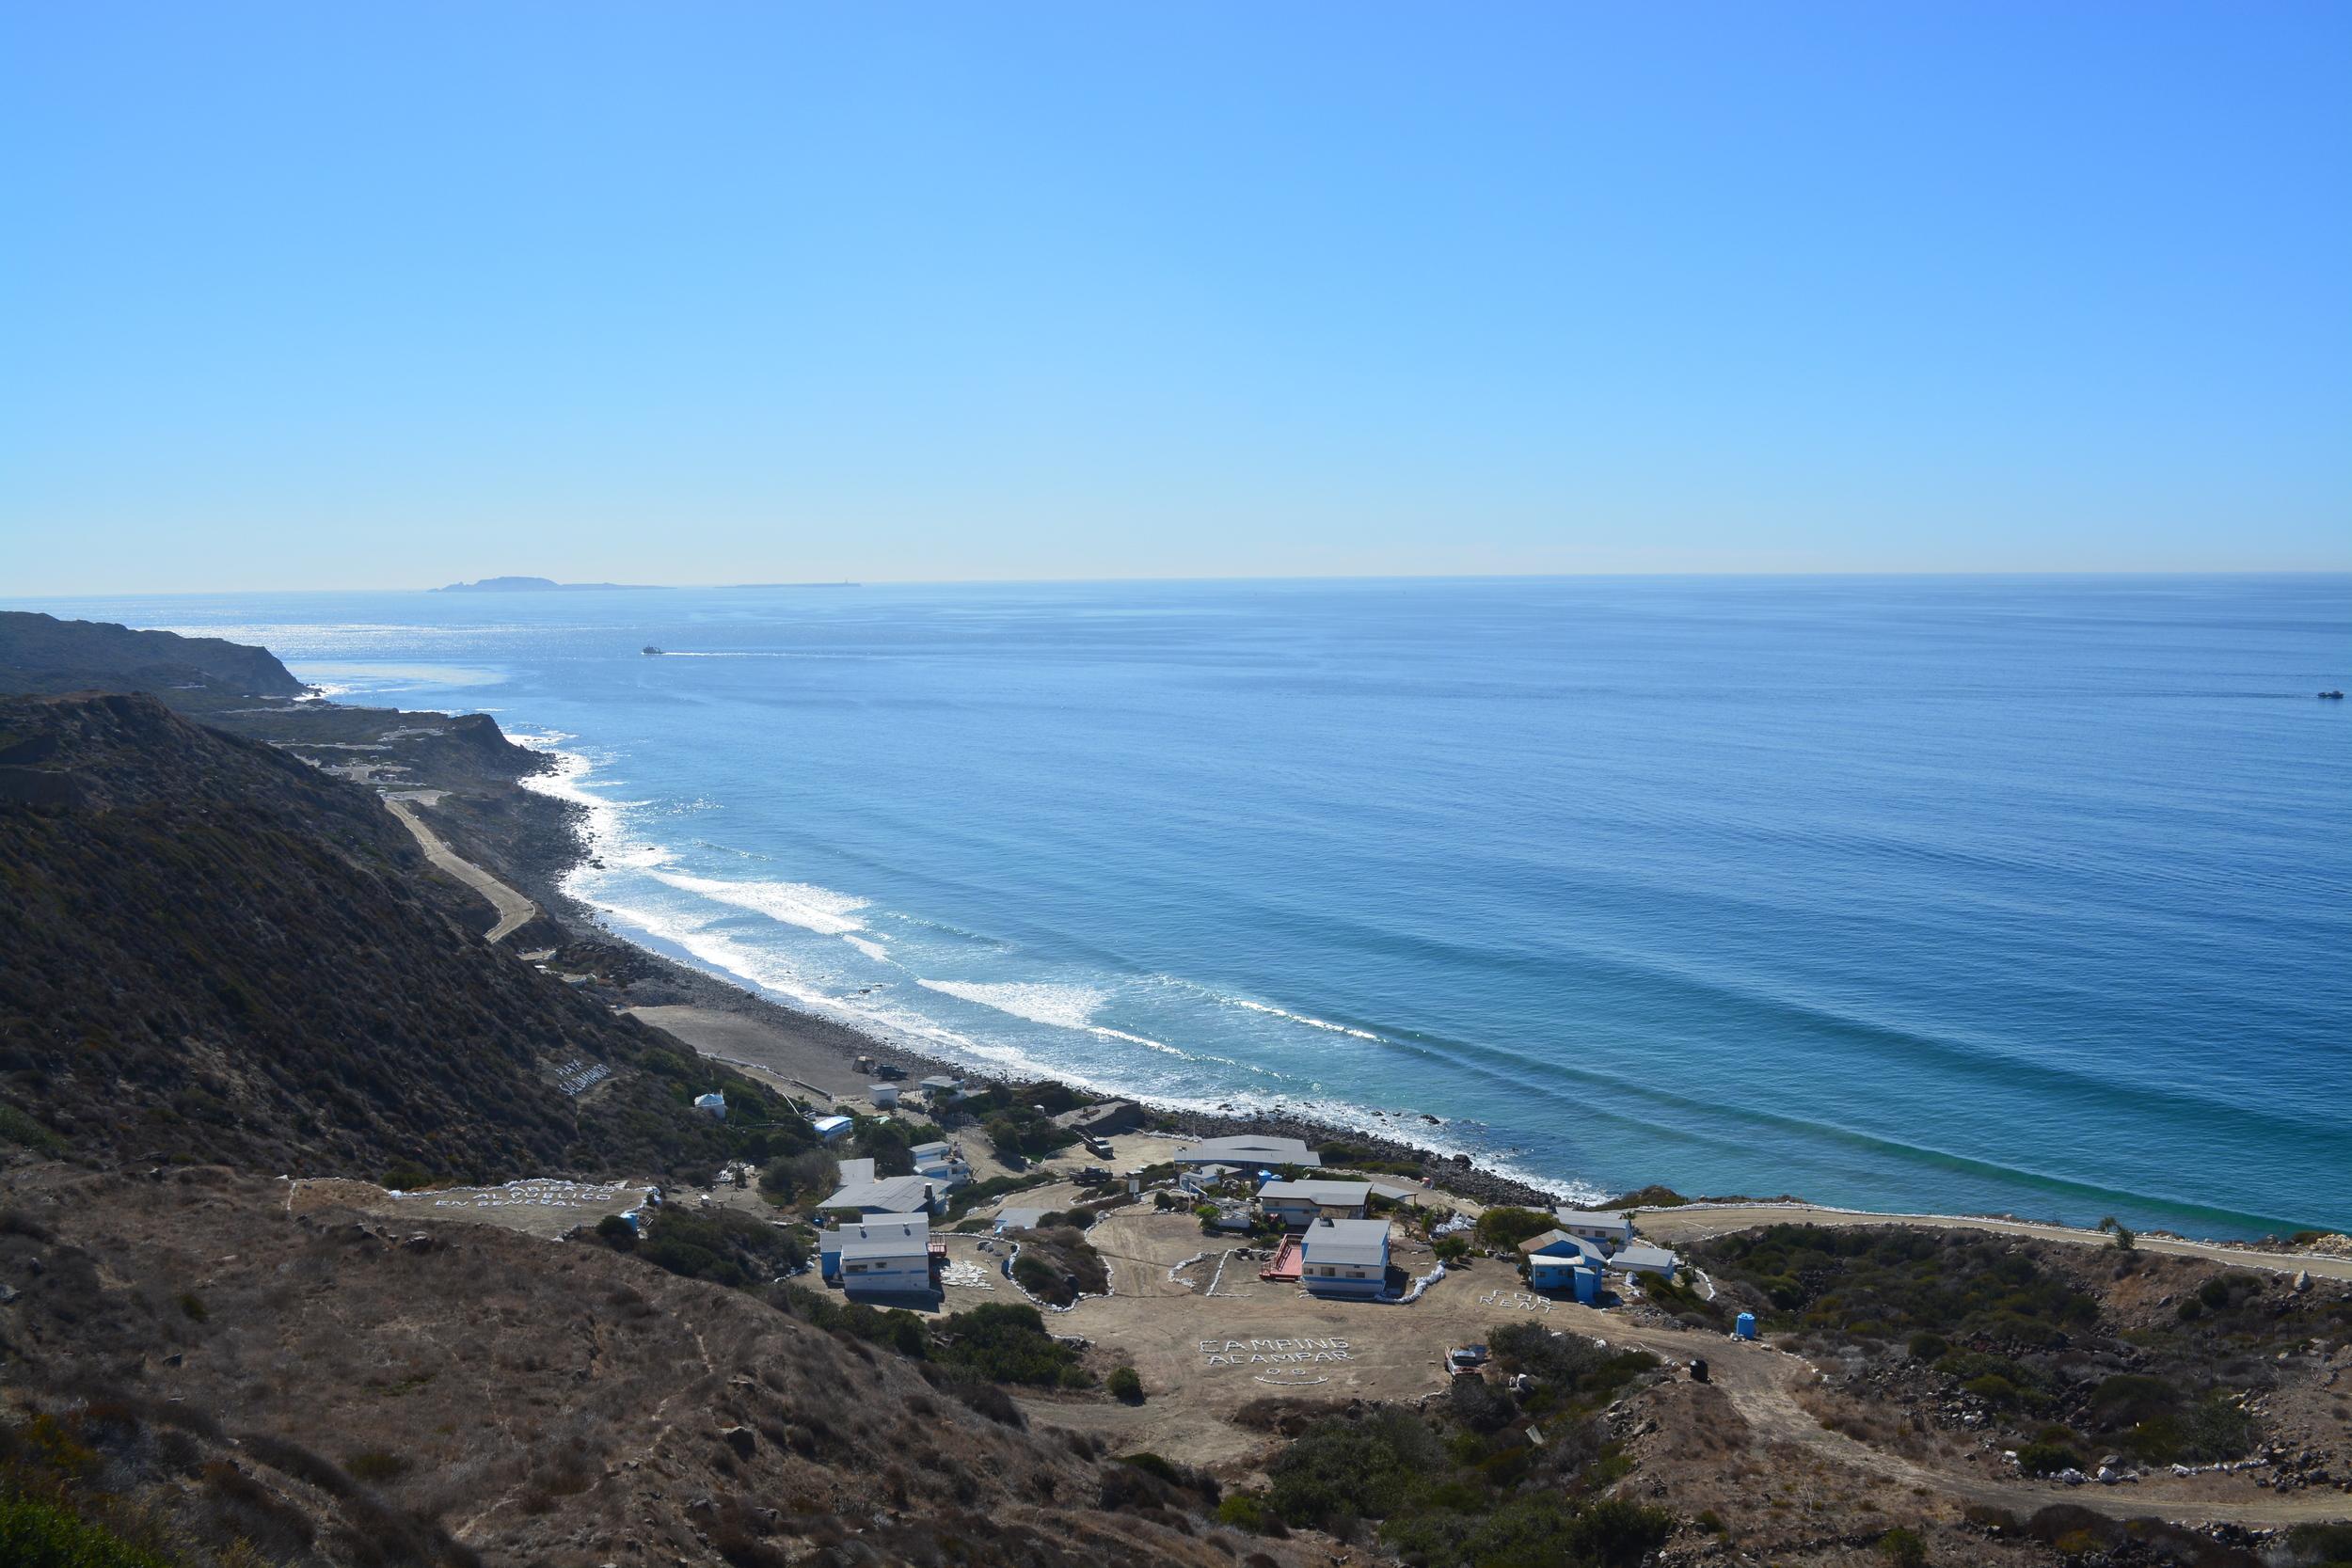 Ocean Experience Surf School Baja Mexico Surfing Adventure (36).JPG